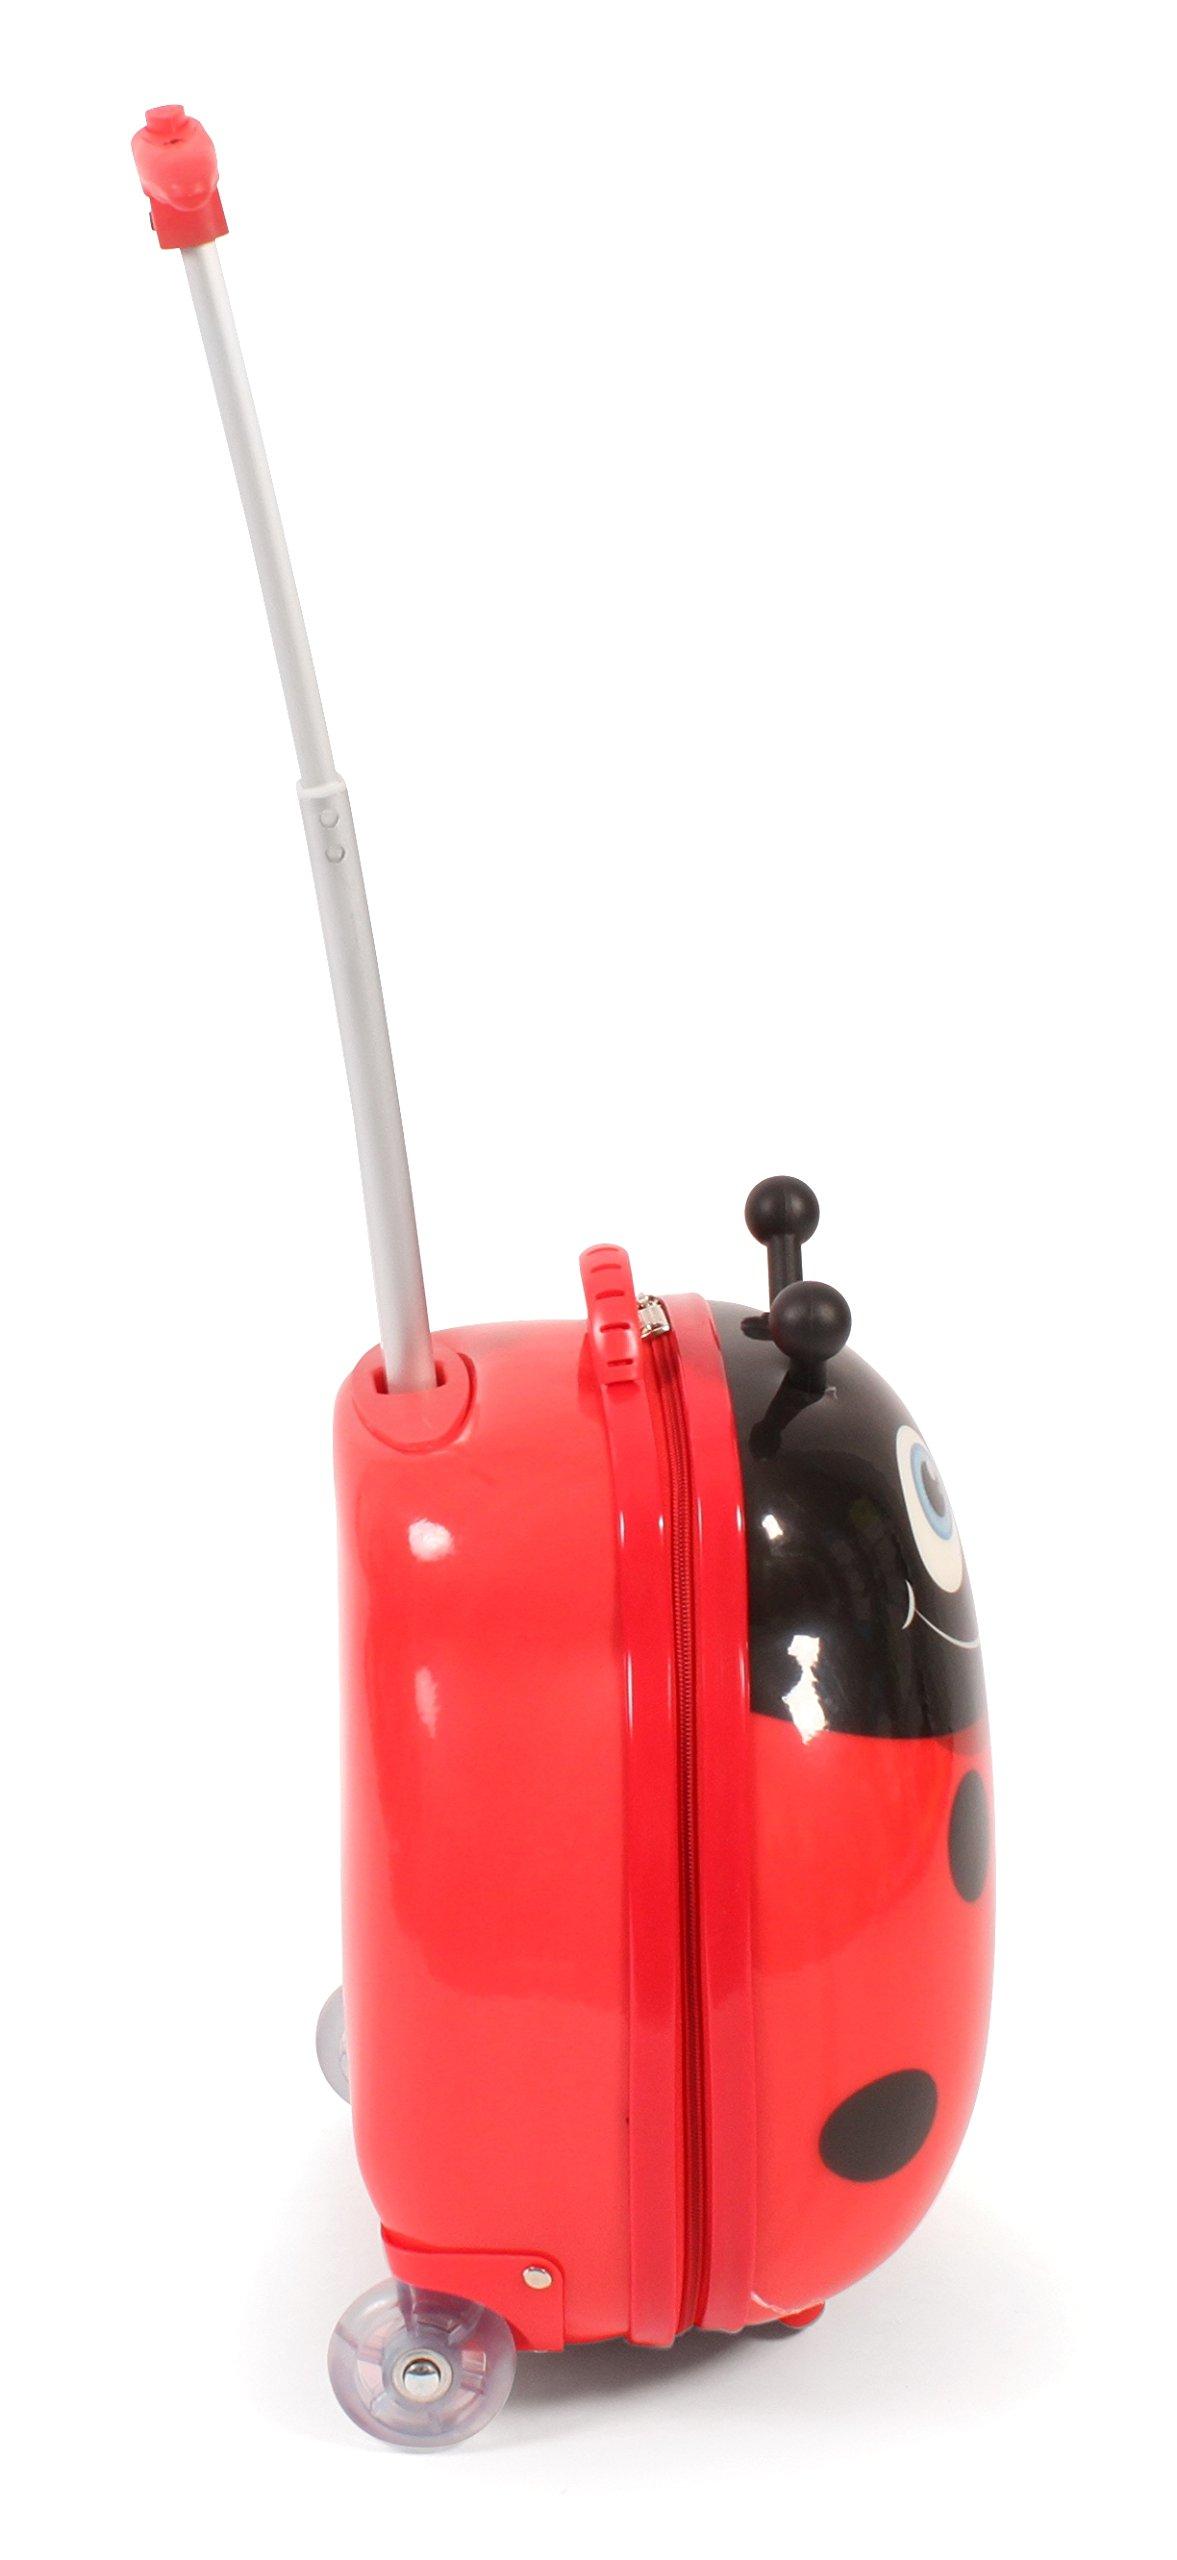 Bayer-Chic-2000-Bouncie-Kinder-Trolley-mit-3D-Marienkfer-Motiv-Kindergepck-20-Liter-Rot